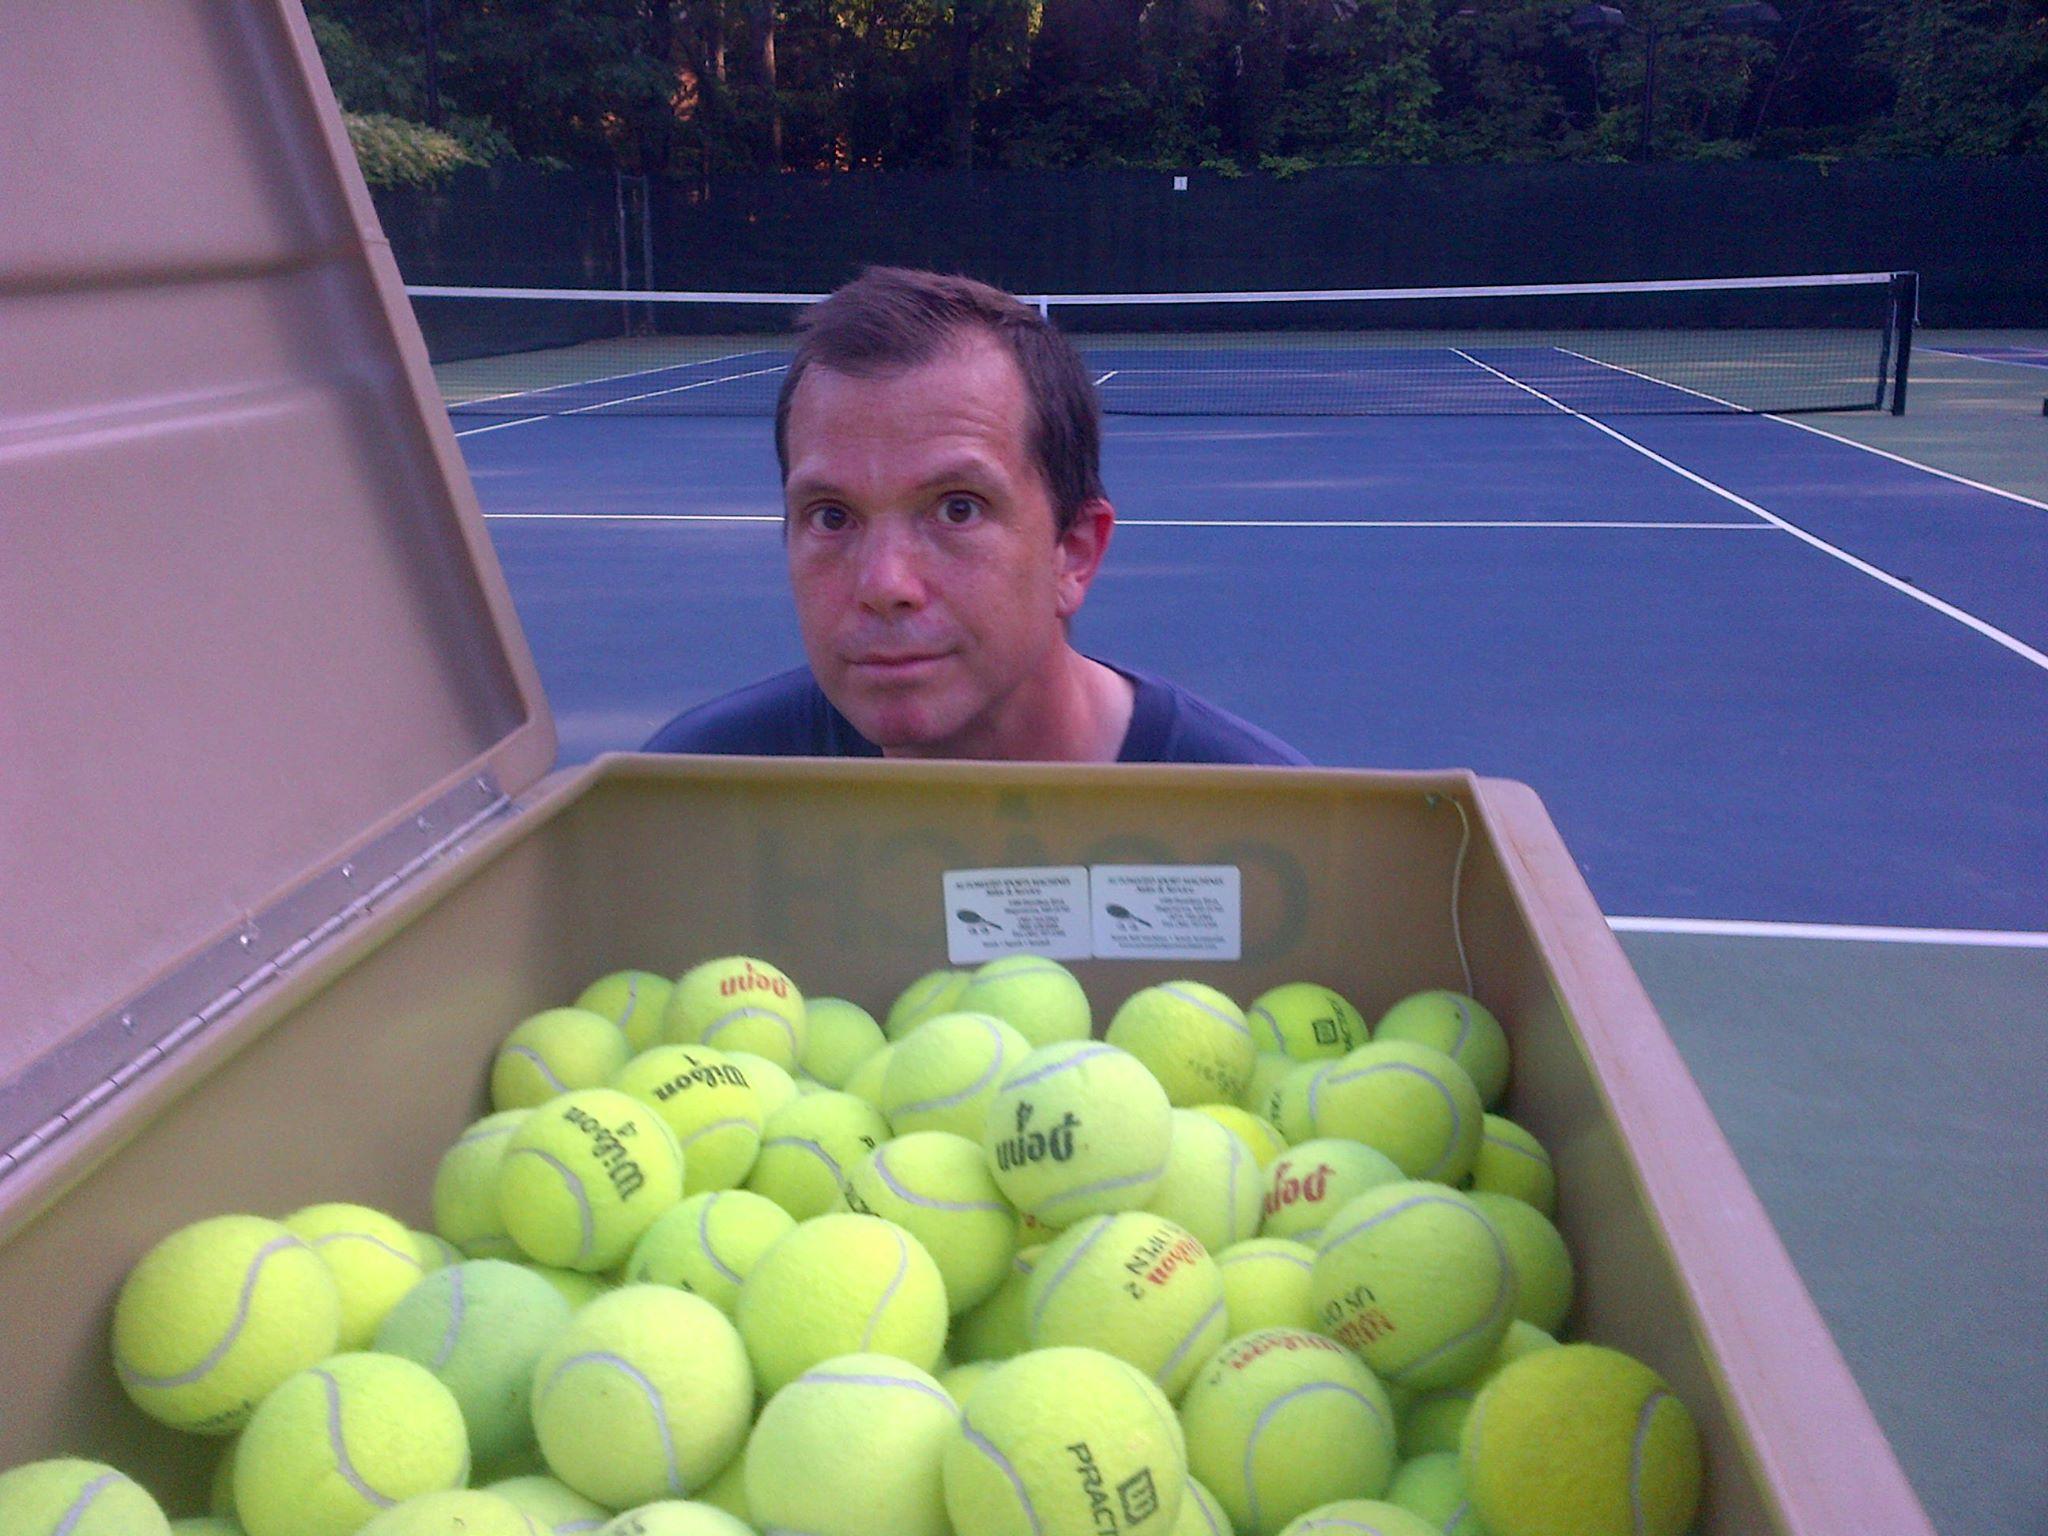 Dmh tennis balls